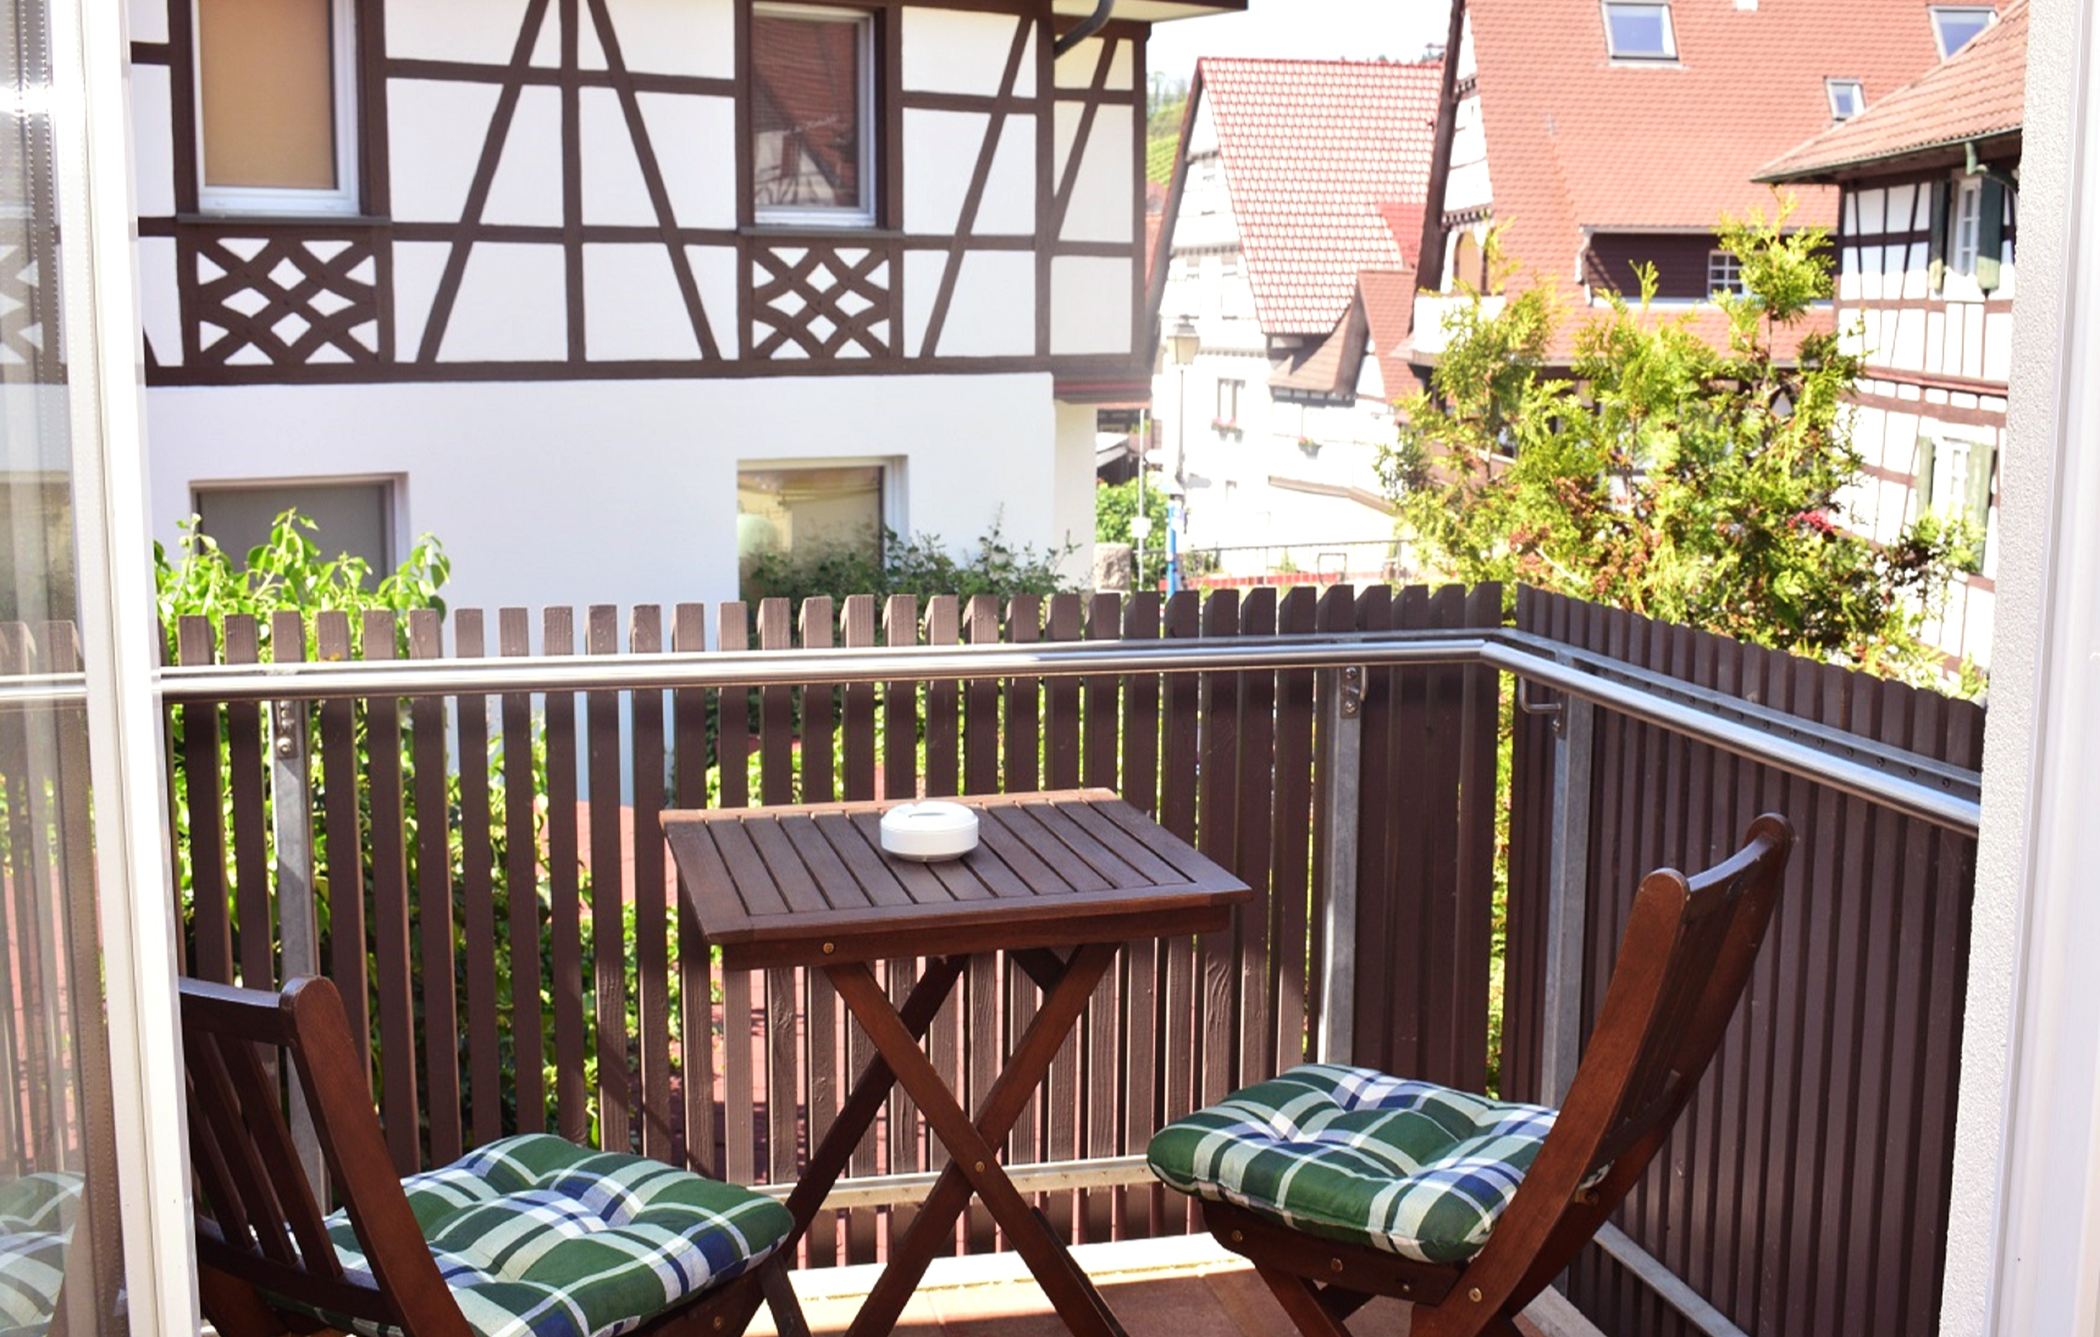 kurzurlaub-sasbachwalden-bg31610627915